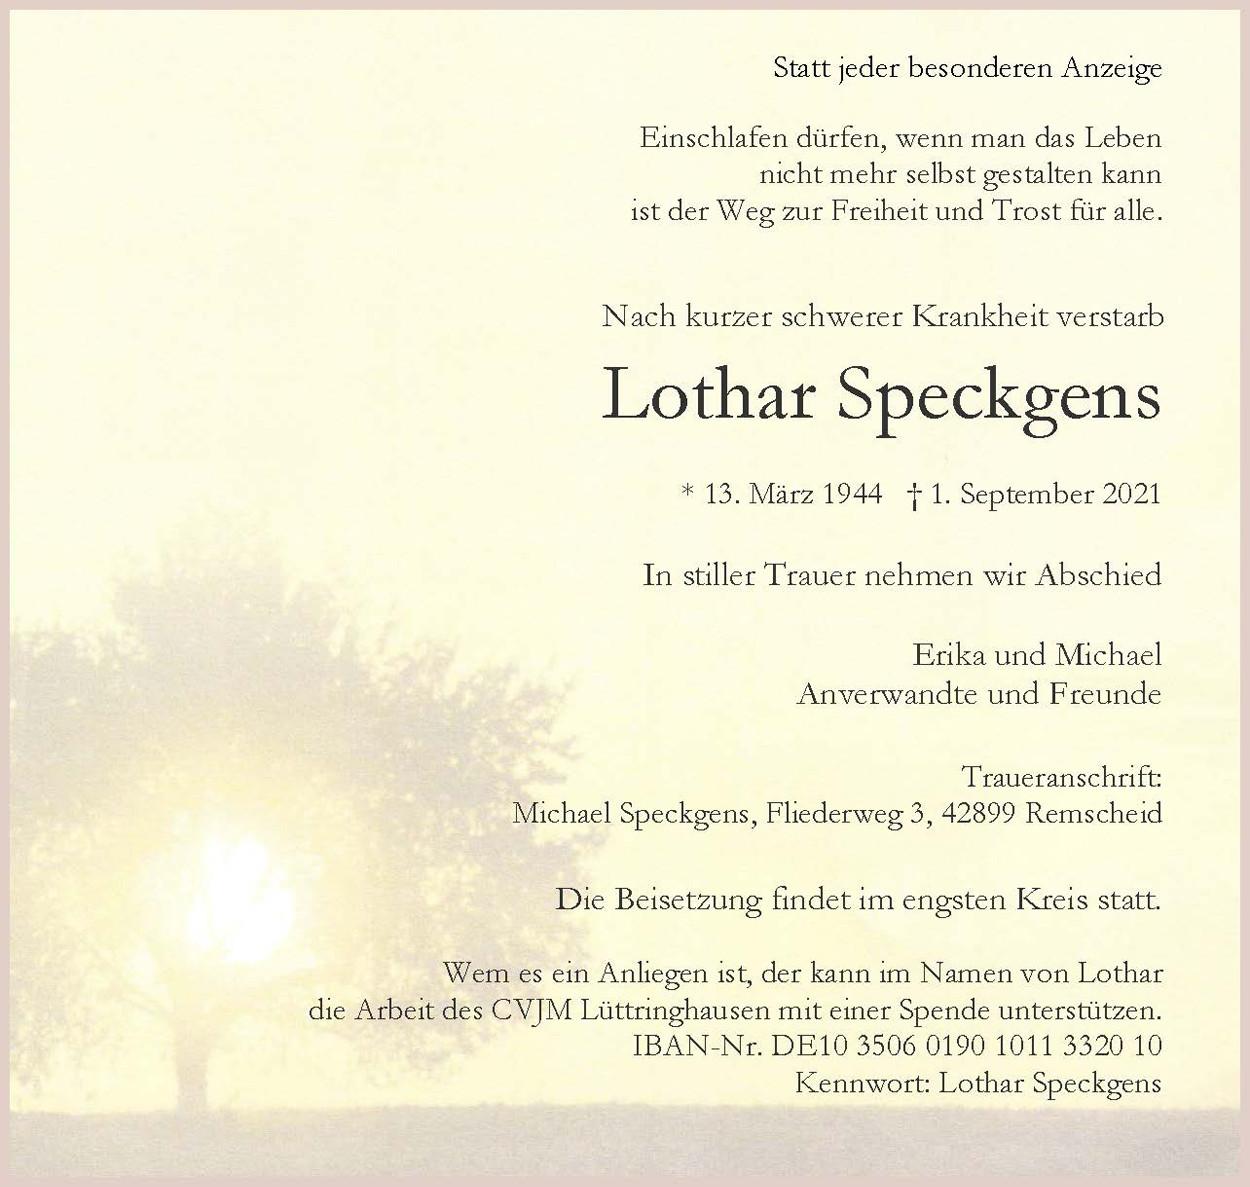 Lothar Speckgens